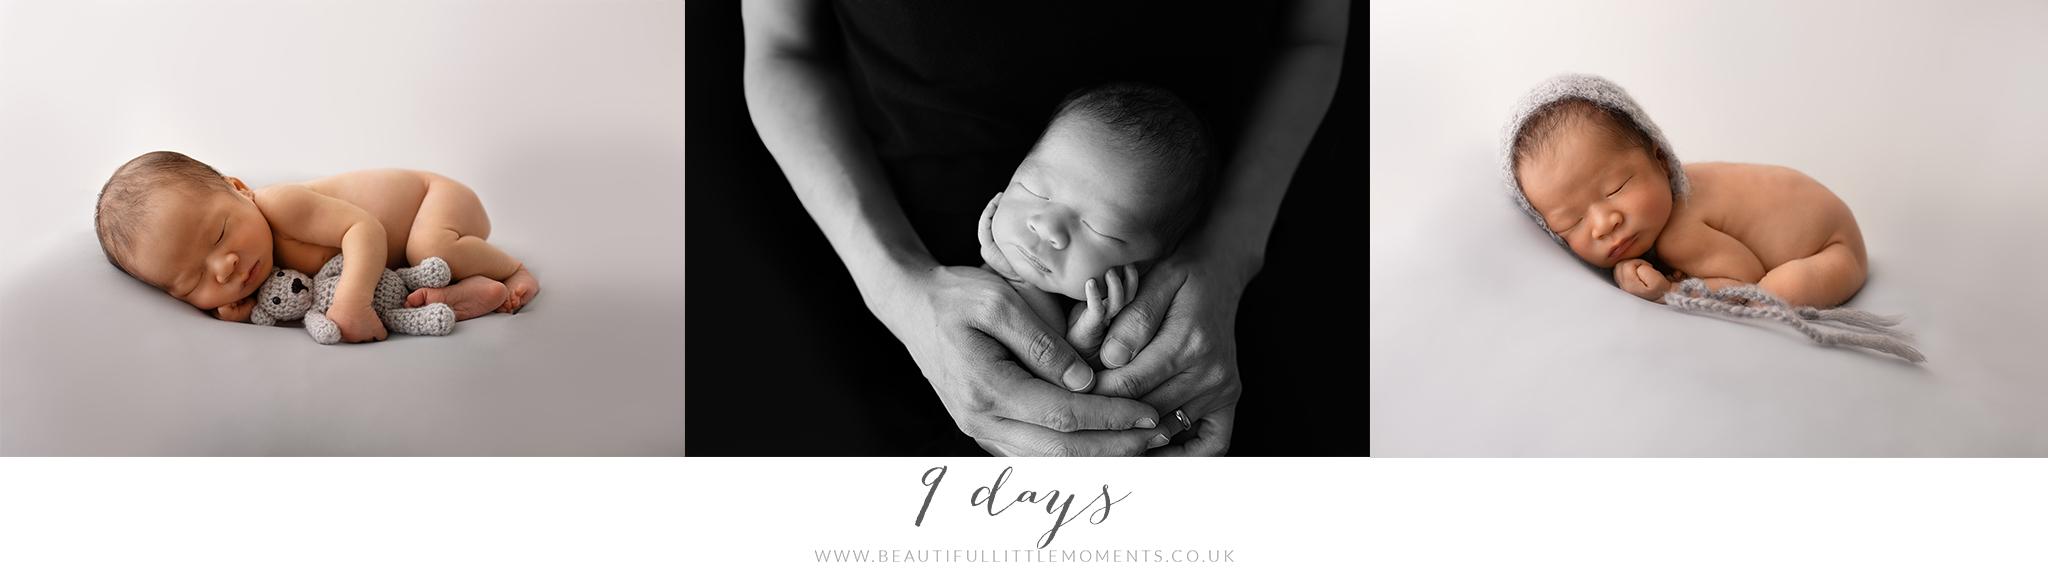 baby photos 9 days new